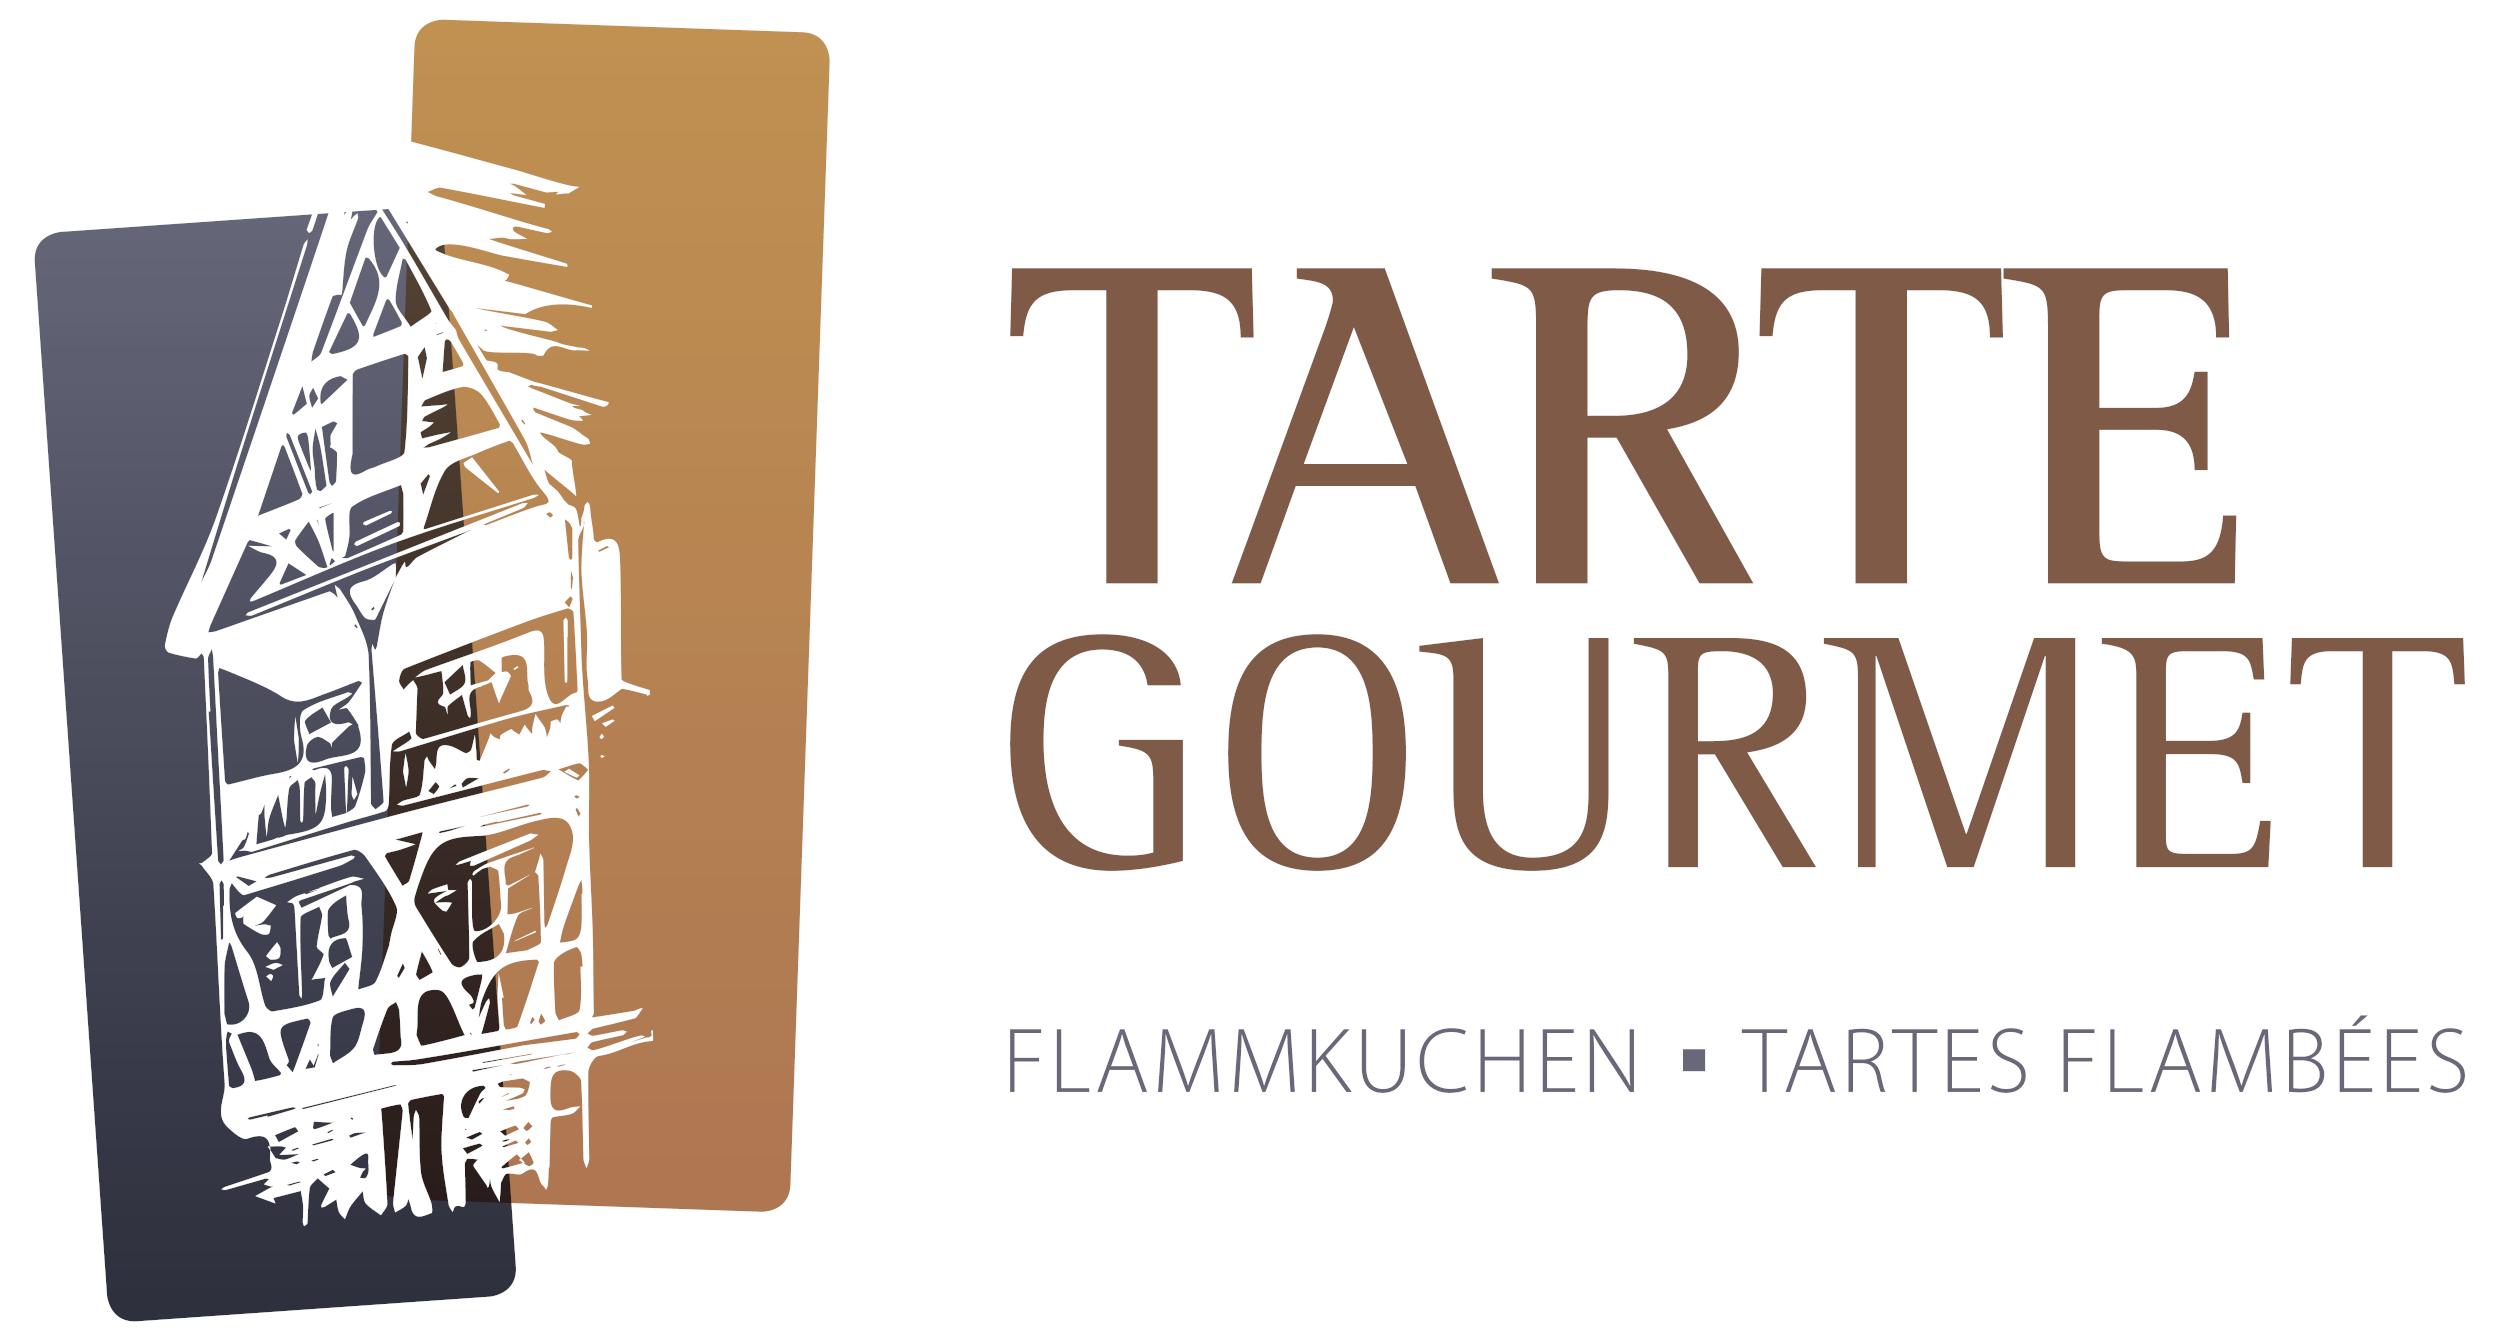 Tarte Gourmet